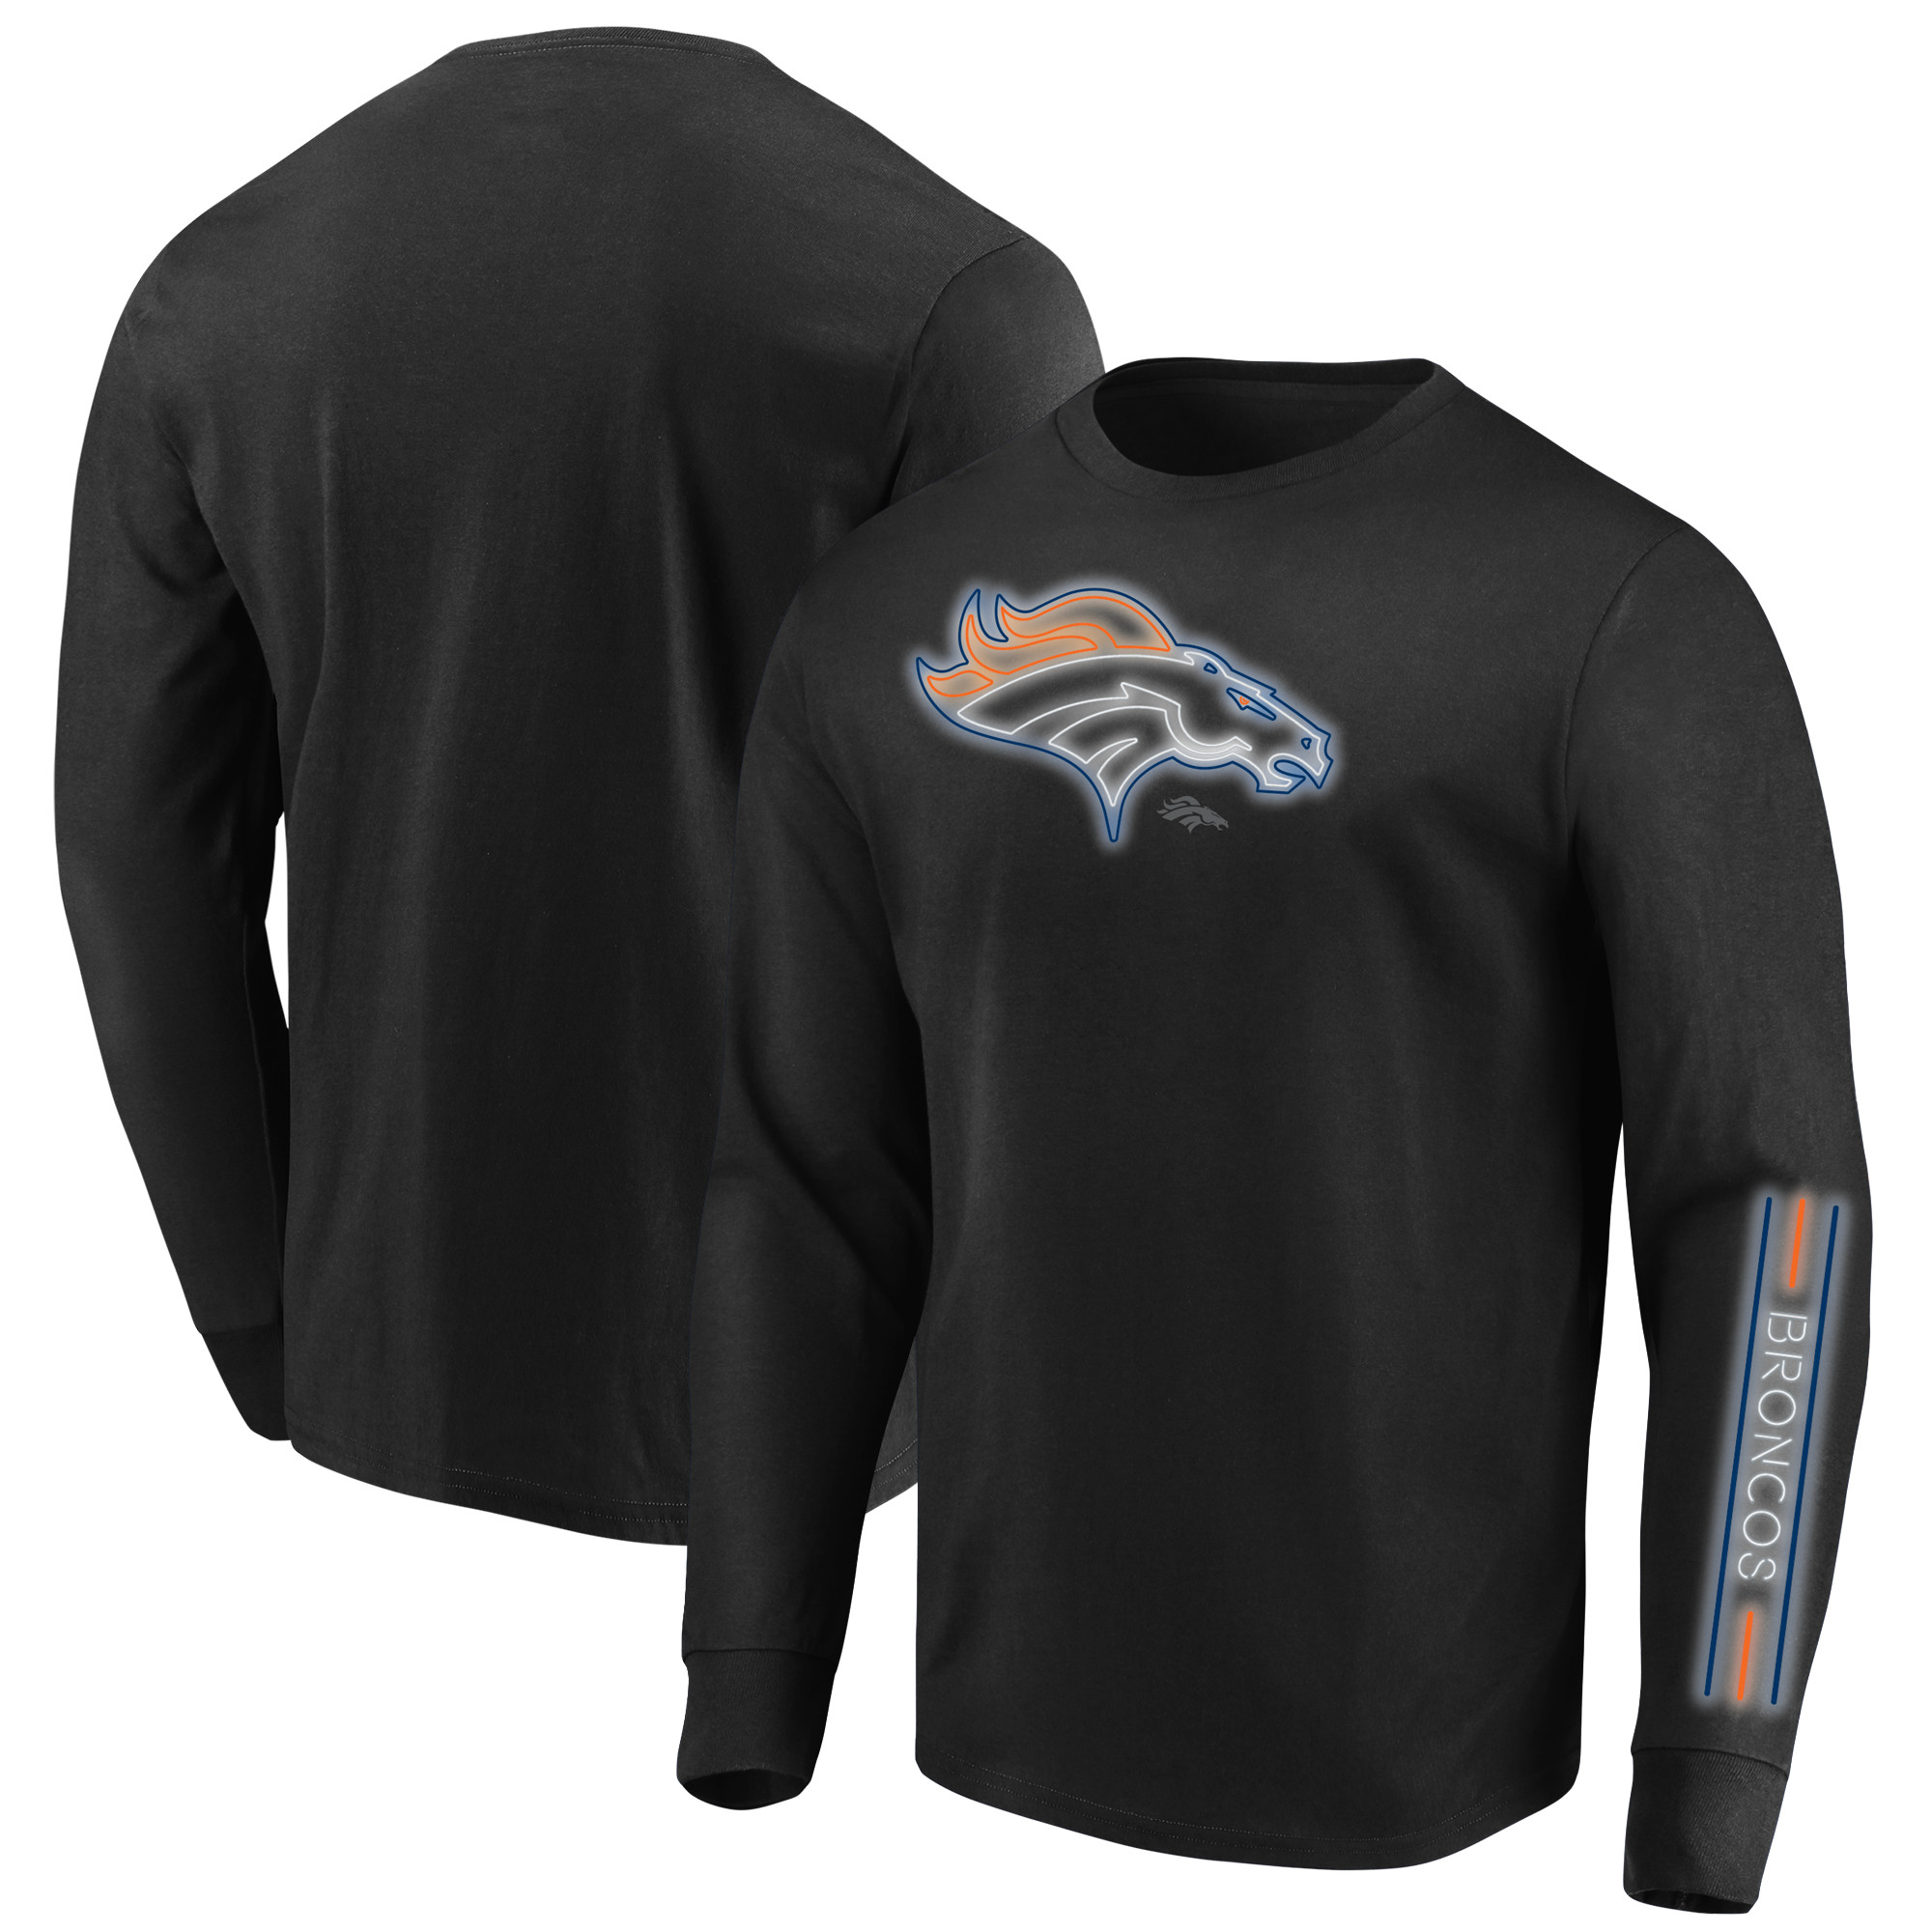 Denver Broncos Majestic Big & Tall Startling Success Long Sleeve T-Shirt - Black